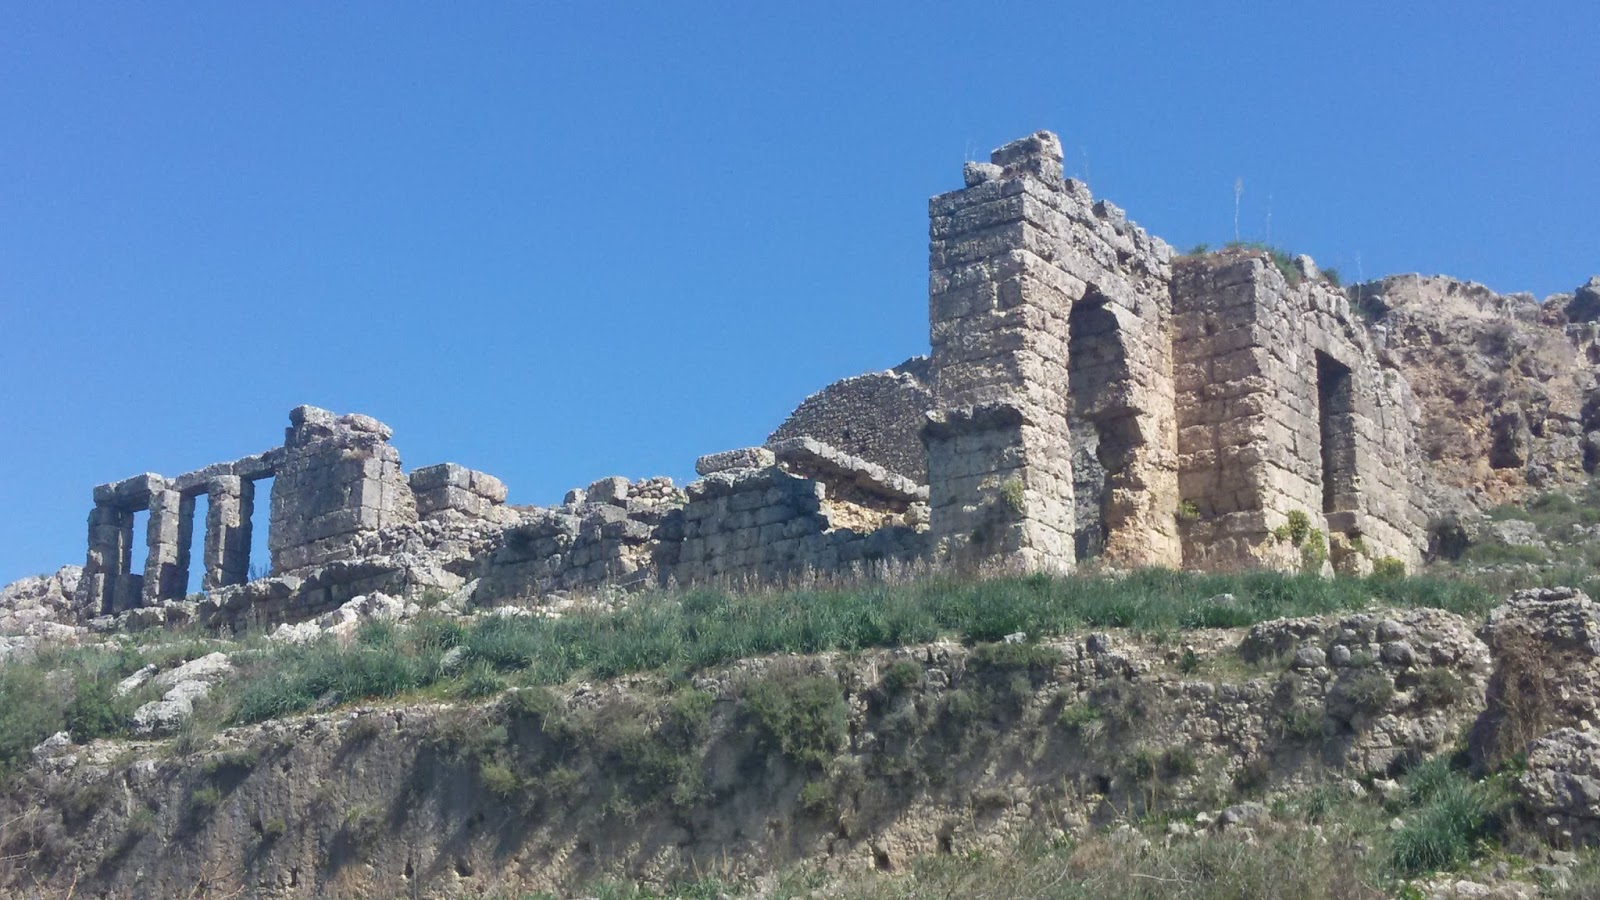 Sillyon / Sillion / Syllion / Trainapolis Antik Kenti – Antalya / Pamfilya